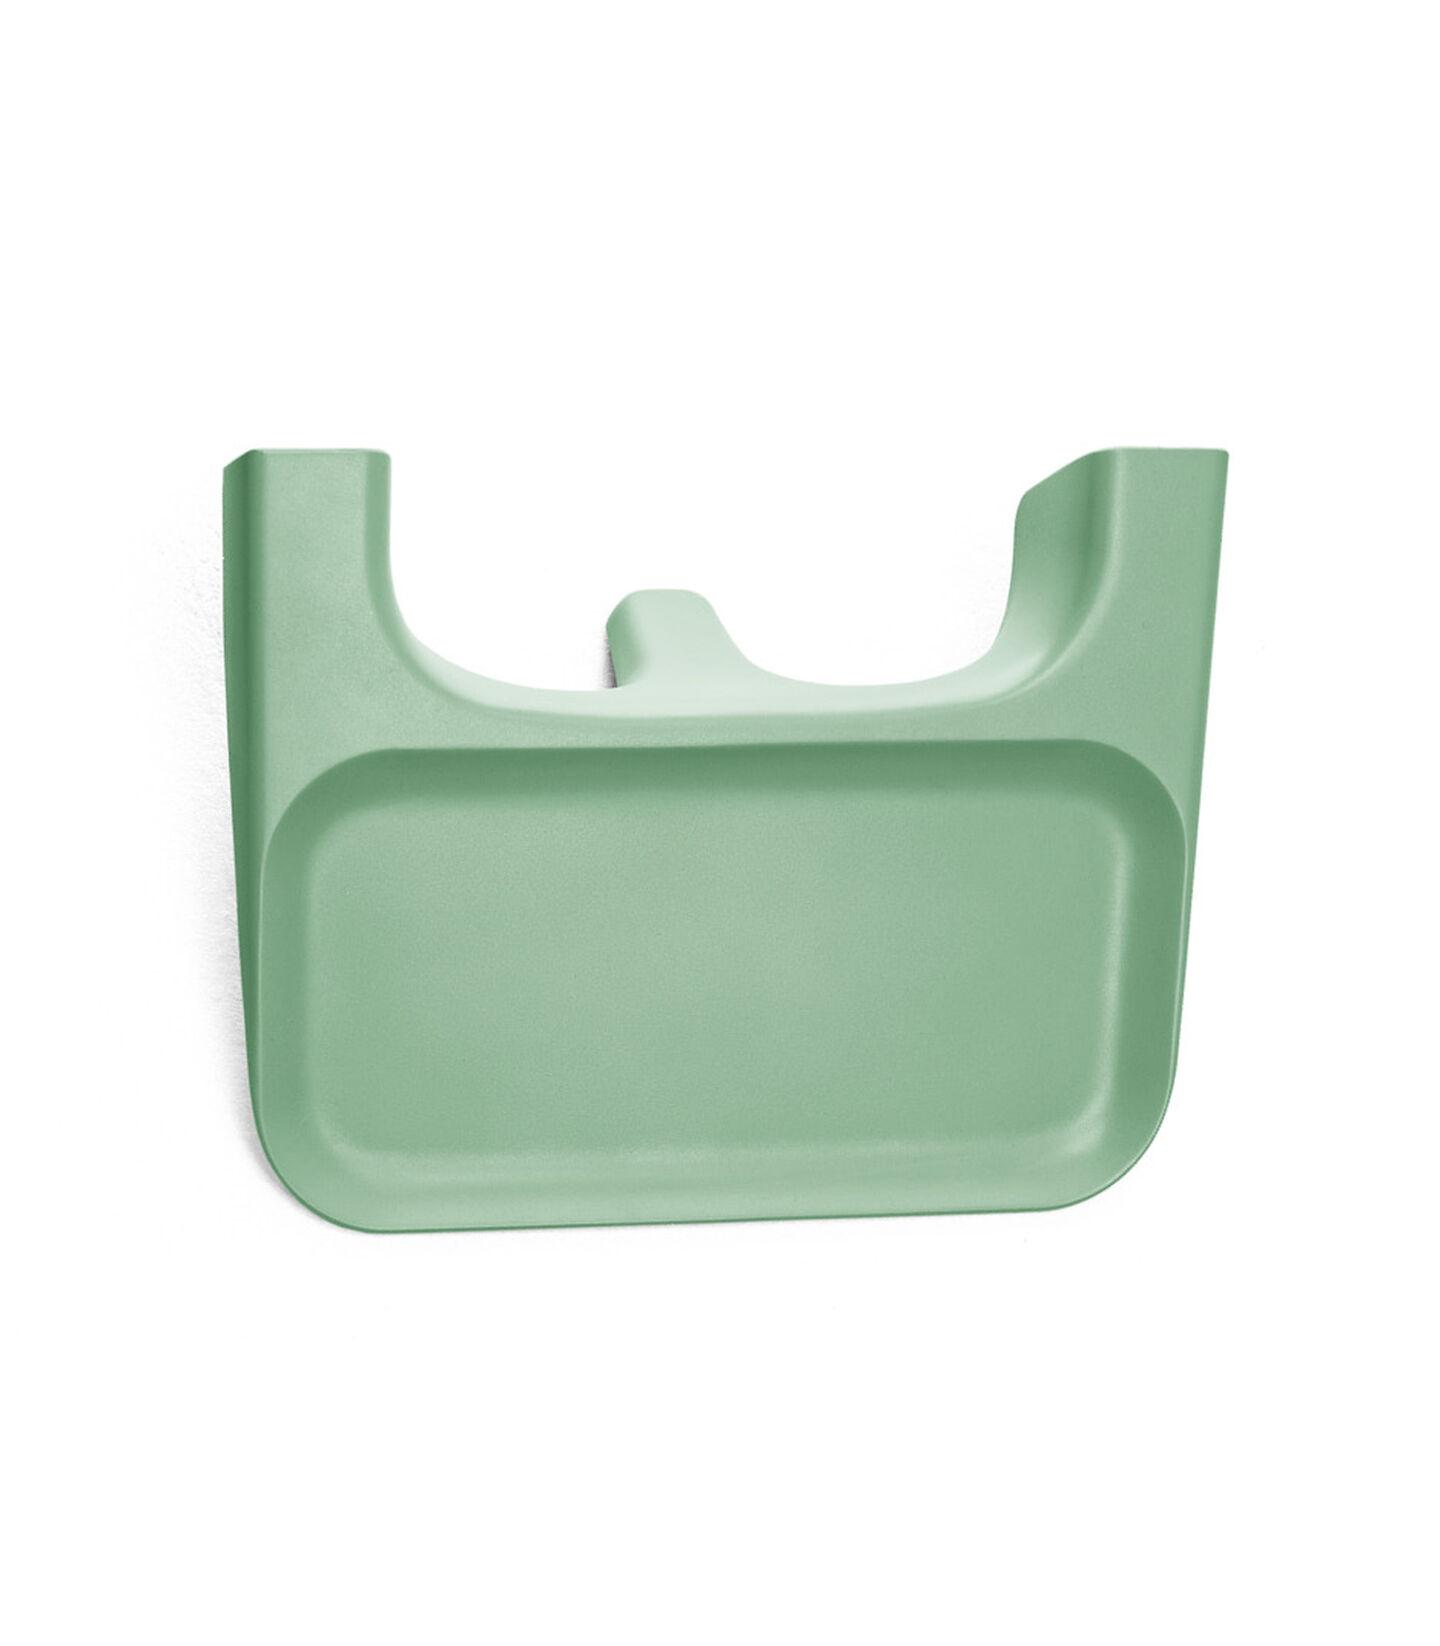 Stokke® Clikk™ Vassoio Clover Green, Verde Trifoglio, mainview view 1